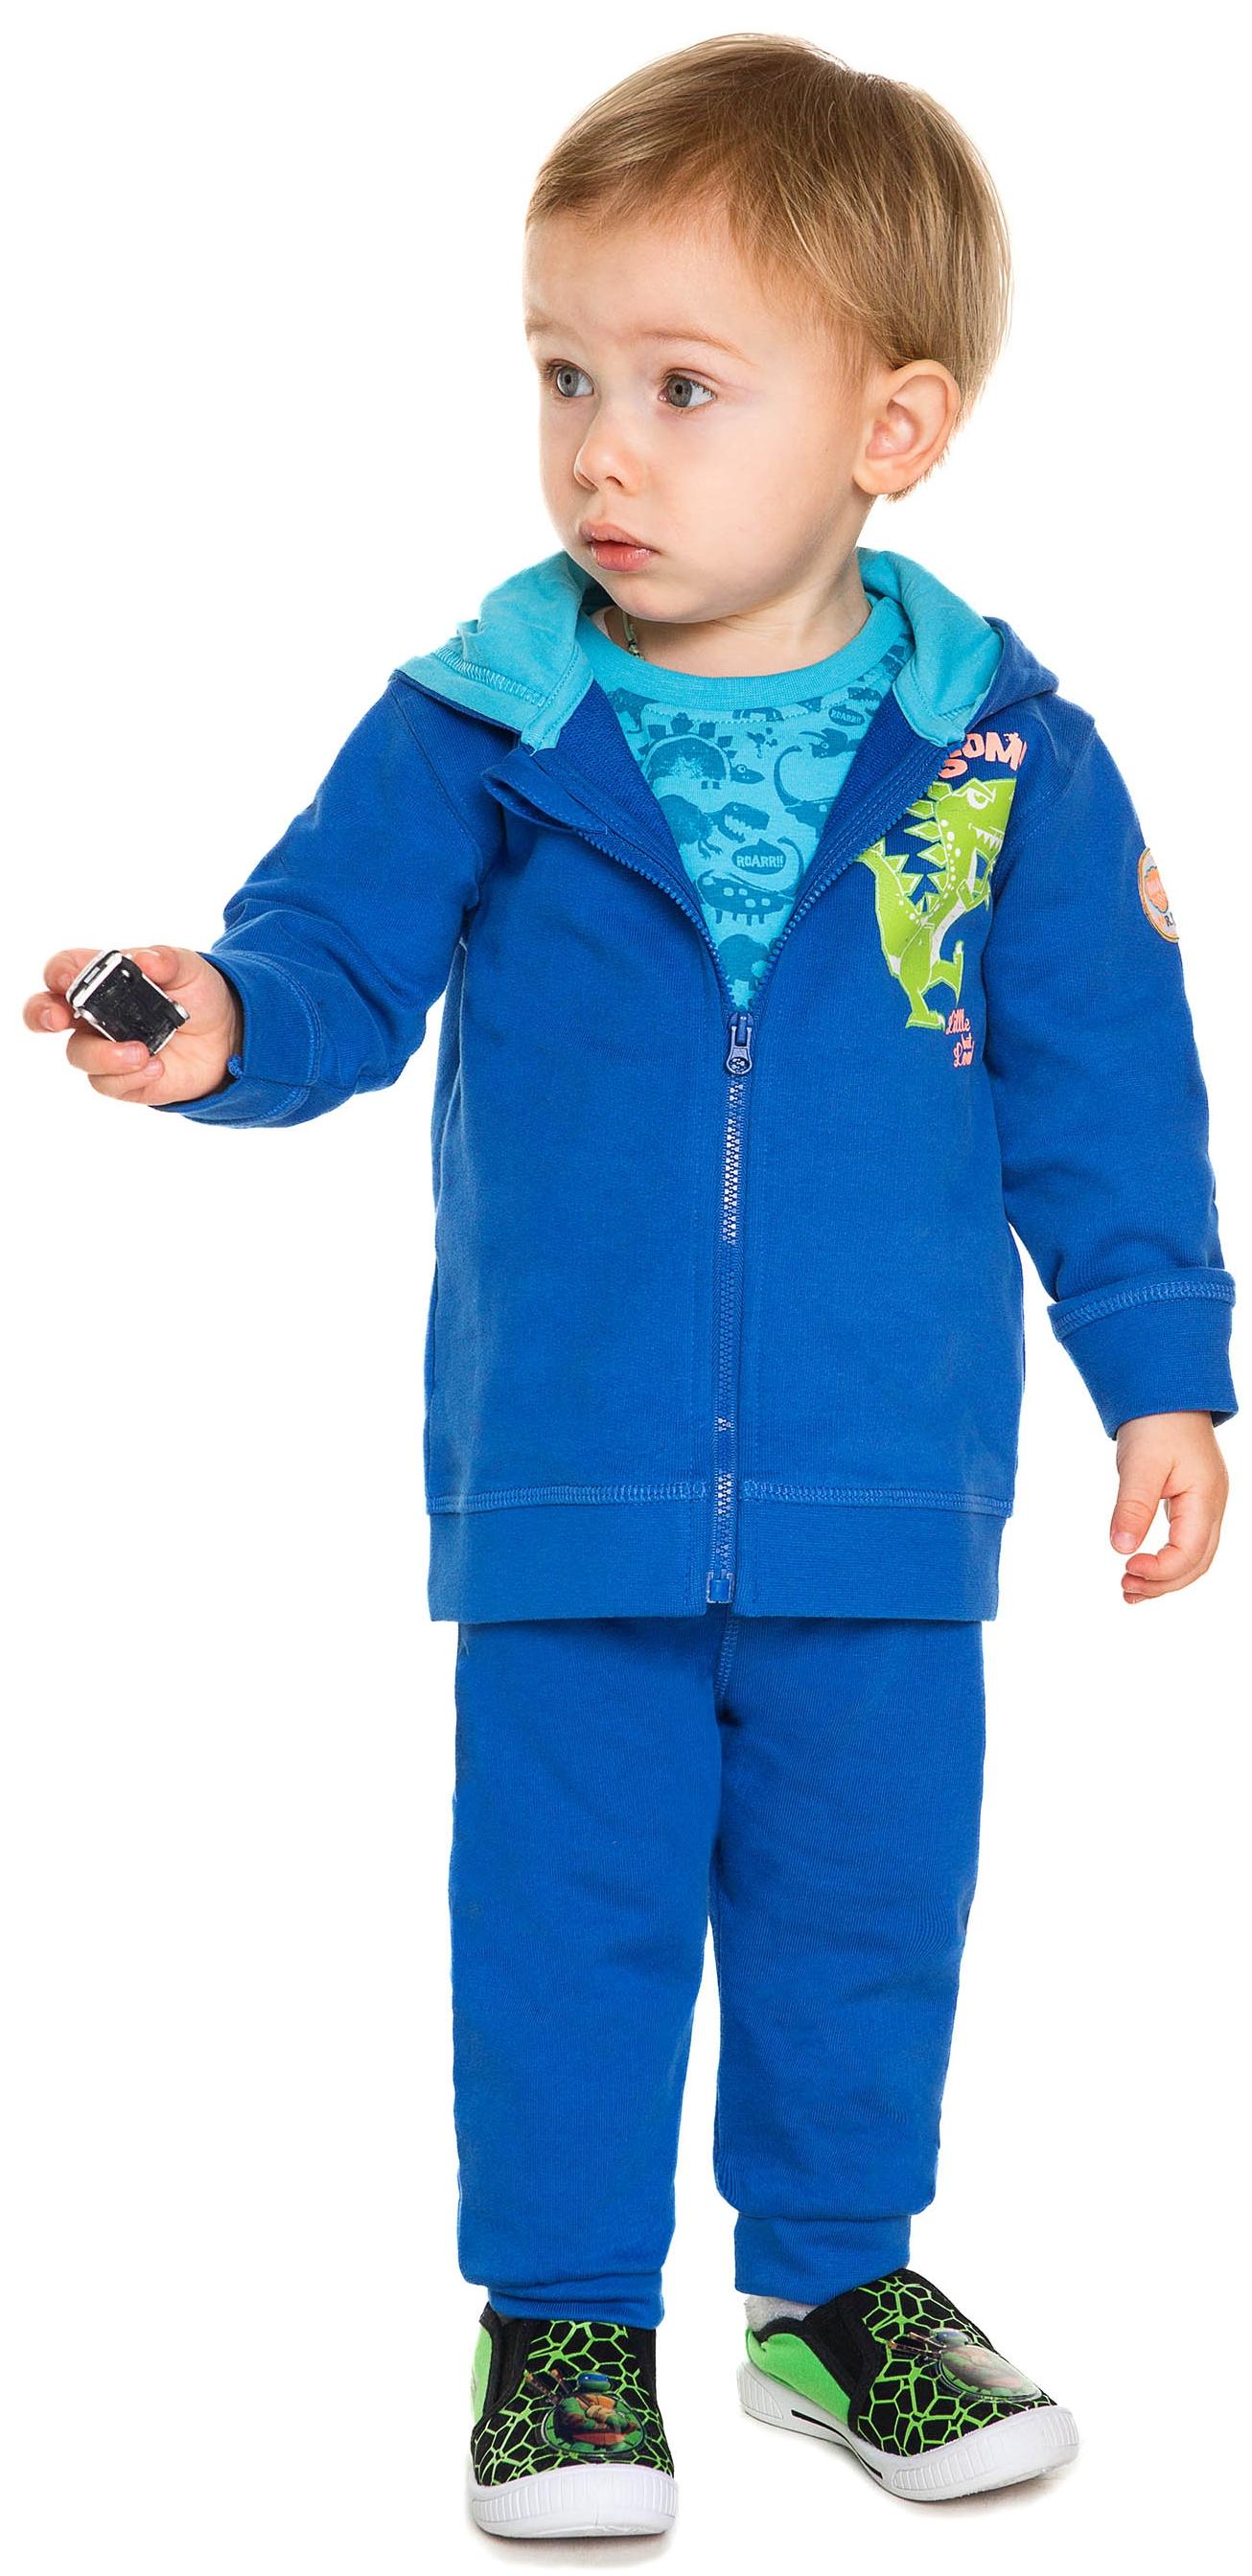 Толстовки Barkito Жакет на молнии с капюшоном для мальчика Barkito, Динозаврики, синий